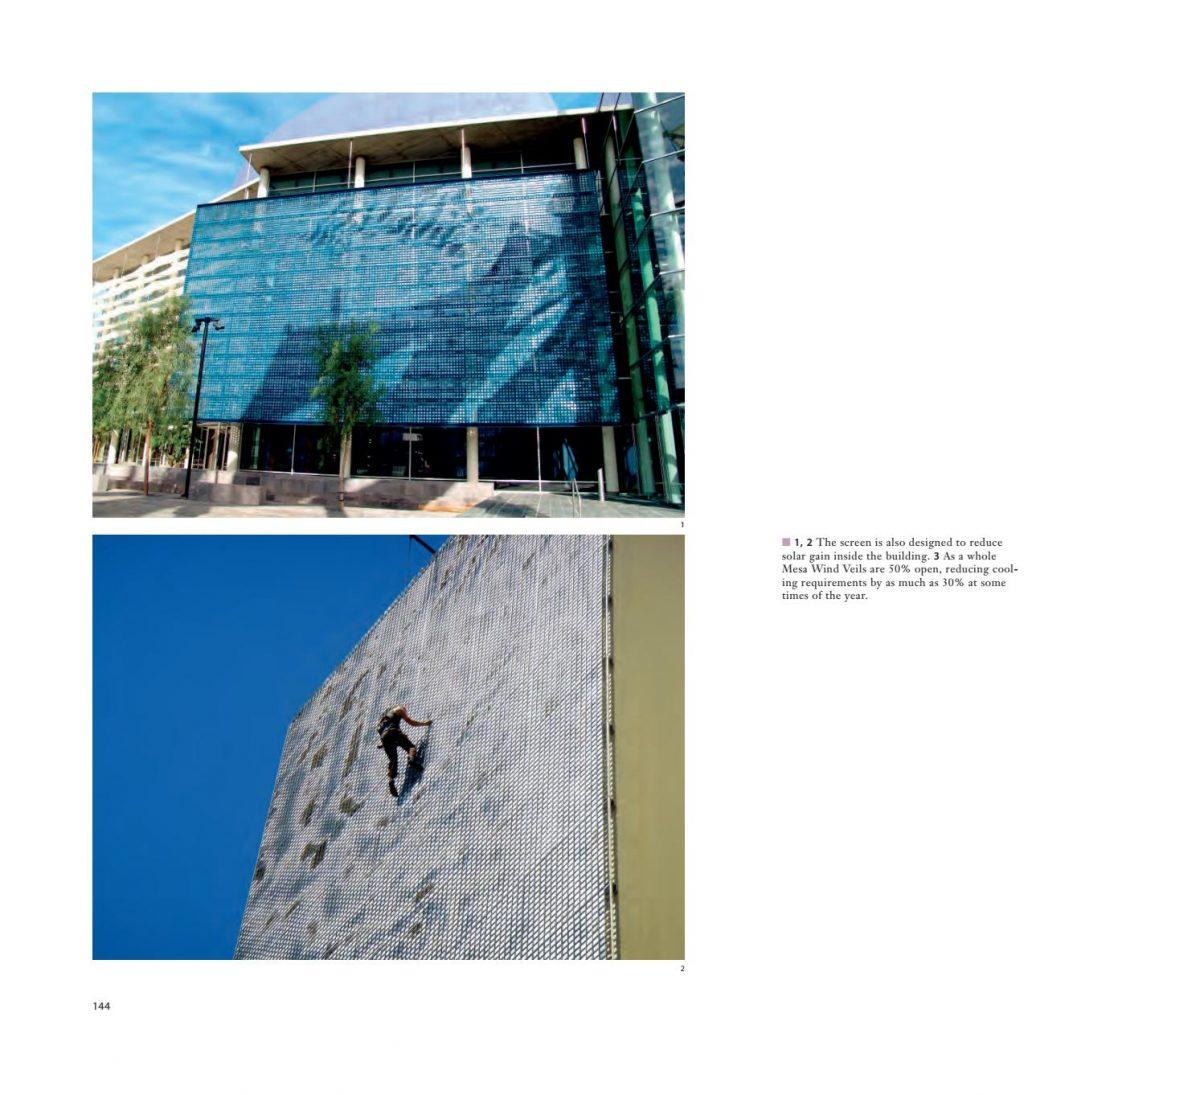 http://www.petkovstudio.com/bg/wp-content/uploads/2017/03/page_144-1200x1095.jpg